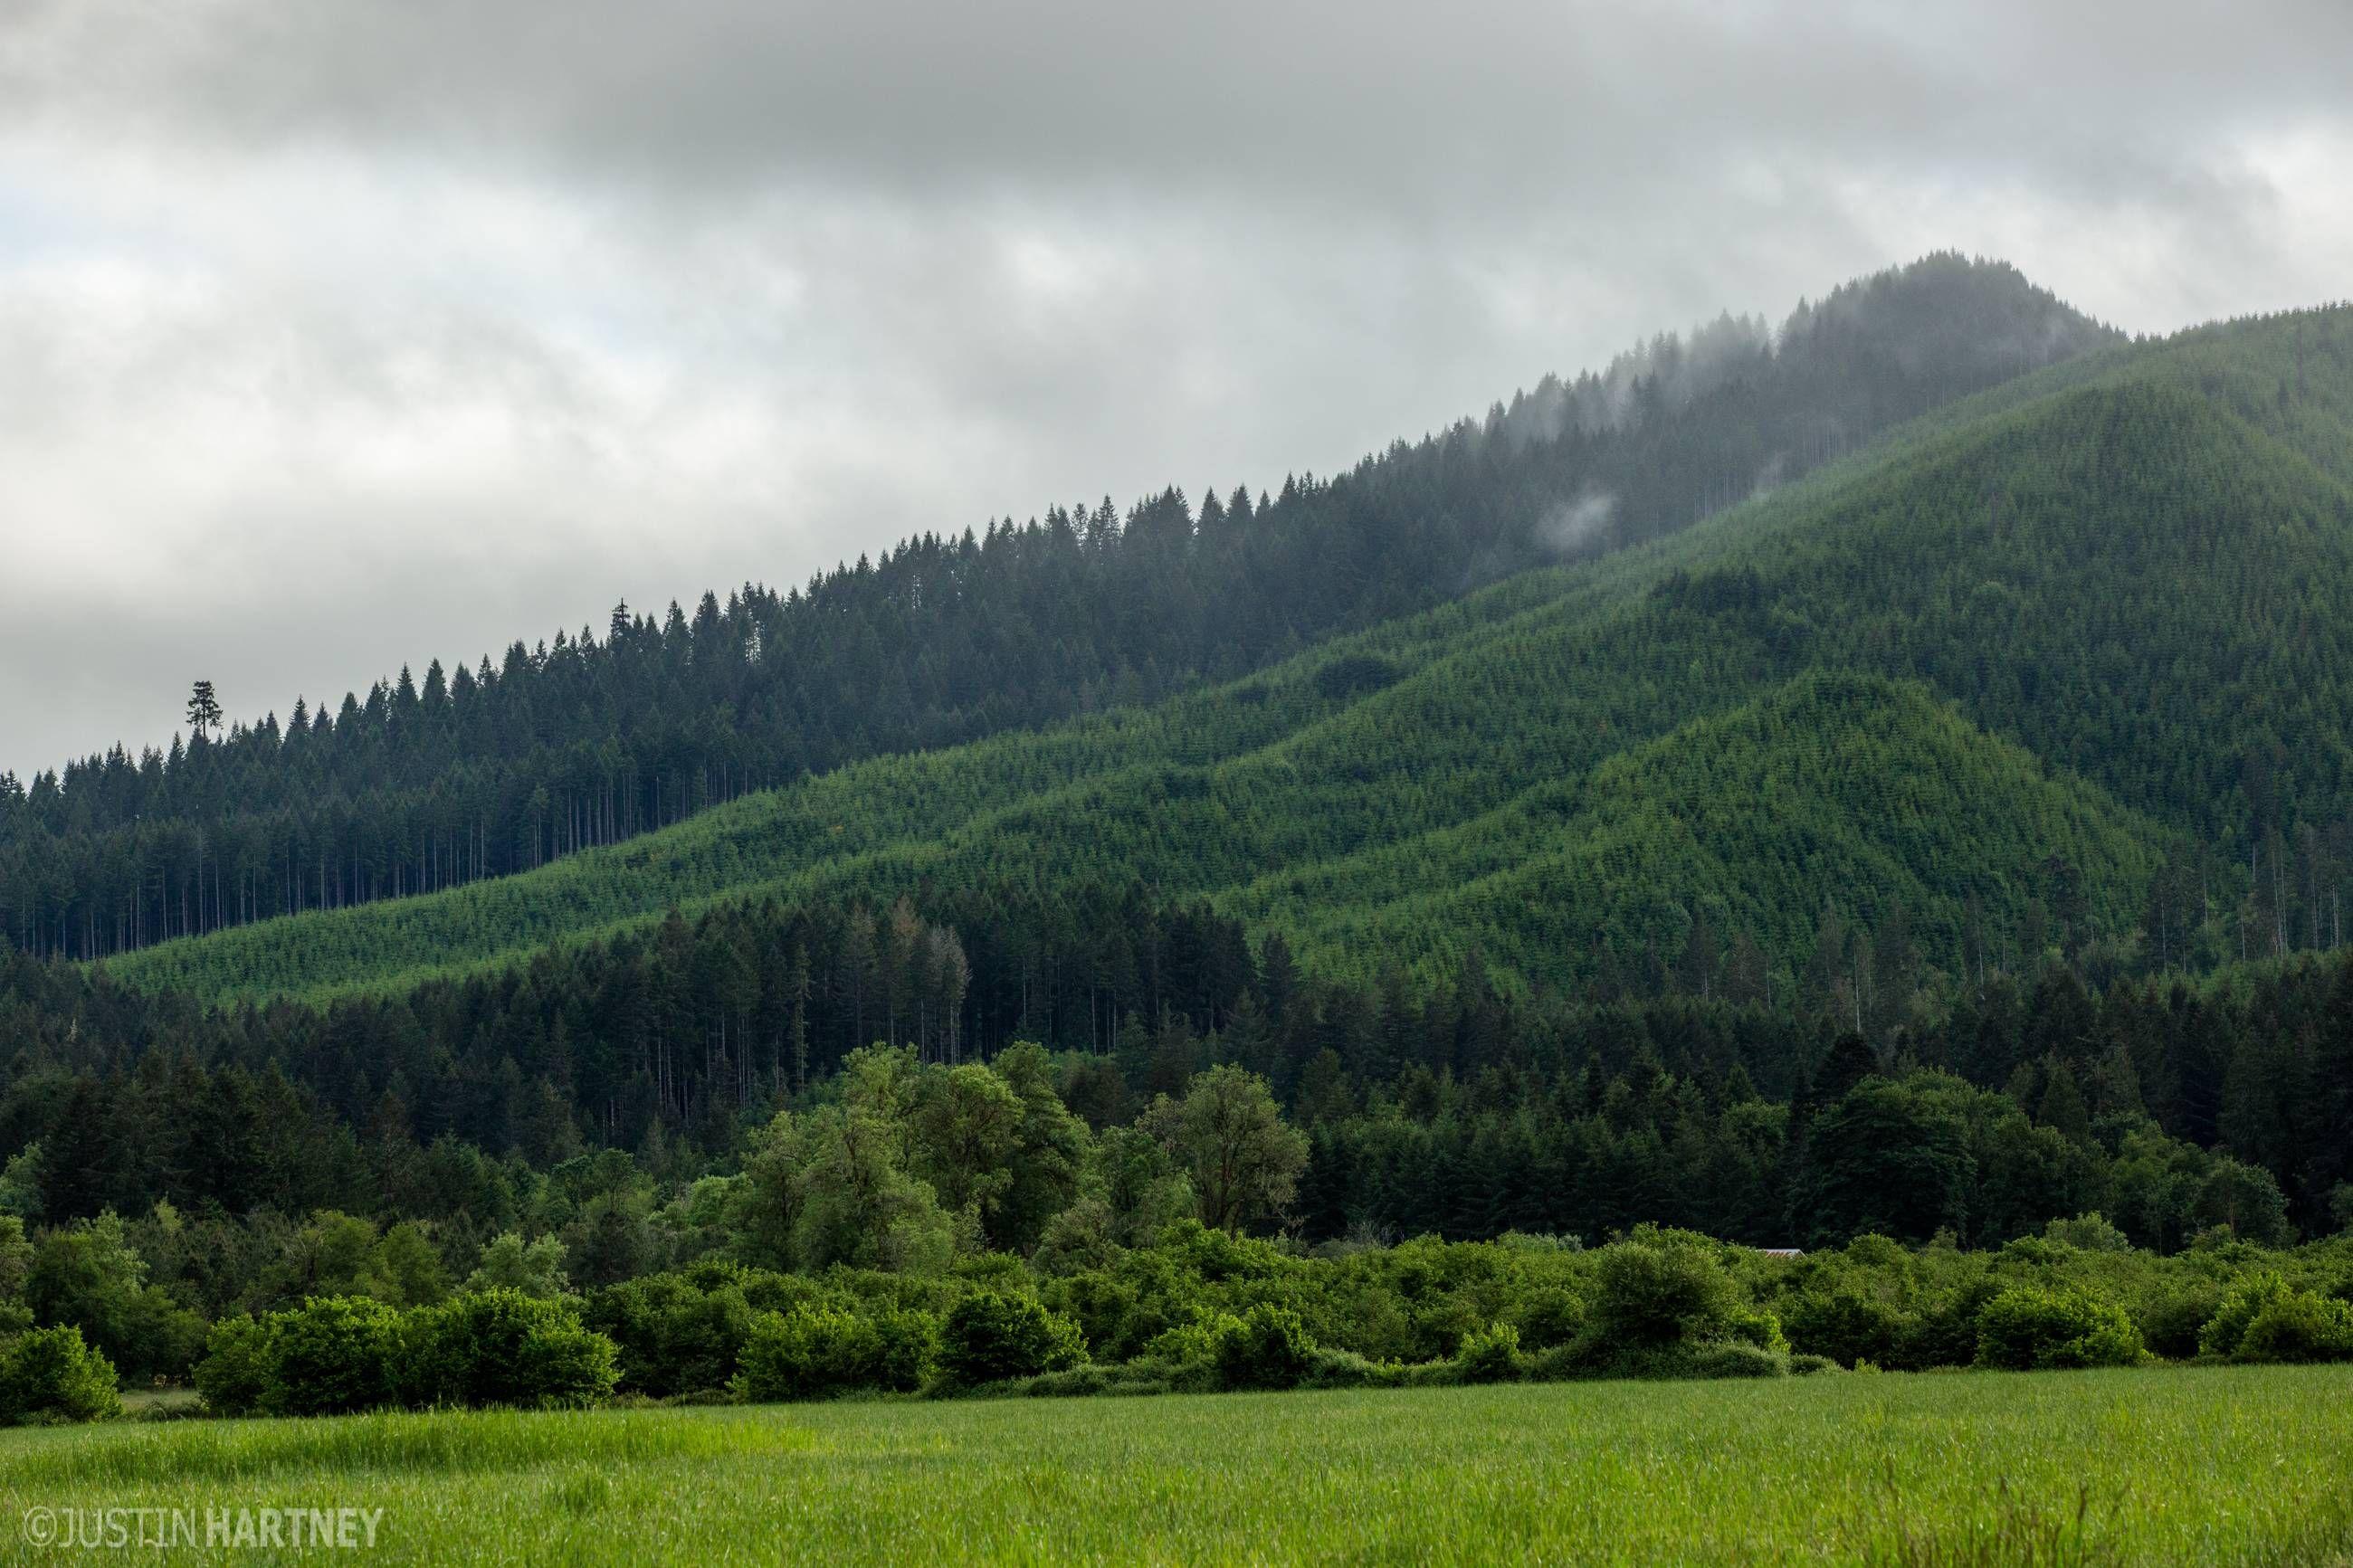 50 Shades of Green - Oregon [OC] p2600x1733]